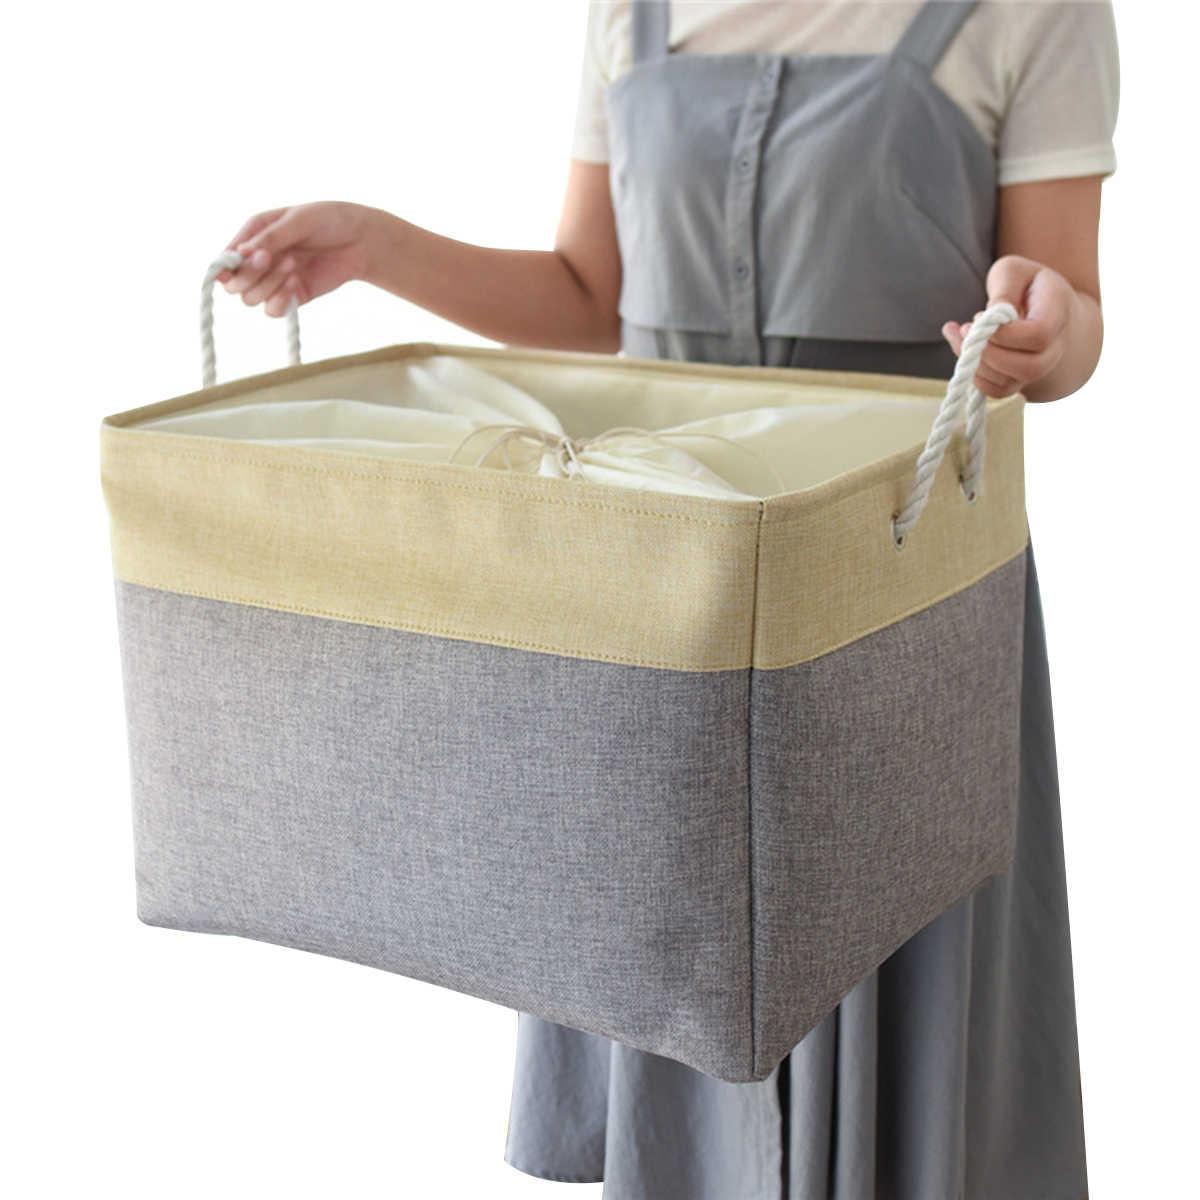 Storage Baskets Multi Purpose Organizer Basket With Handles For Laundry Hamper Toy Bins Gift Basket Bedroom Clothes Baby Nursery Storage Baskets Aliexpress